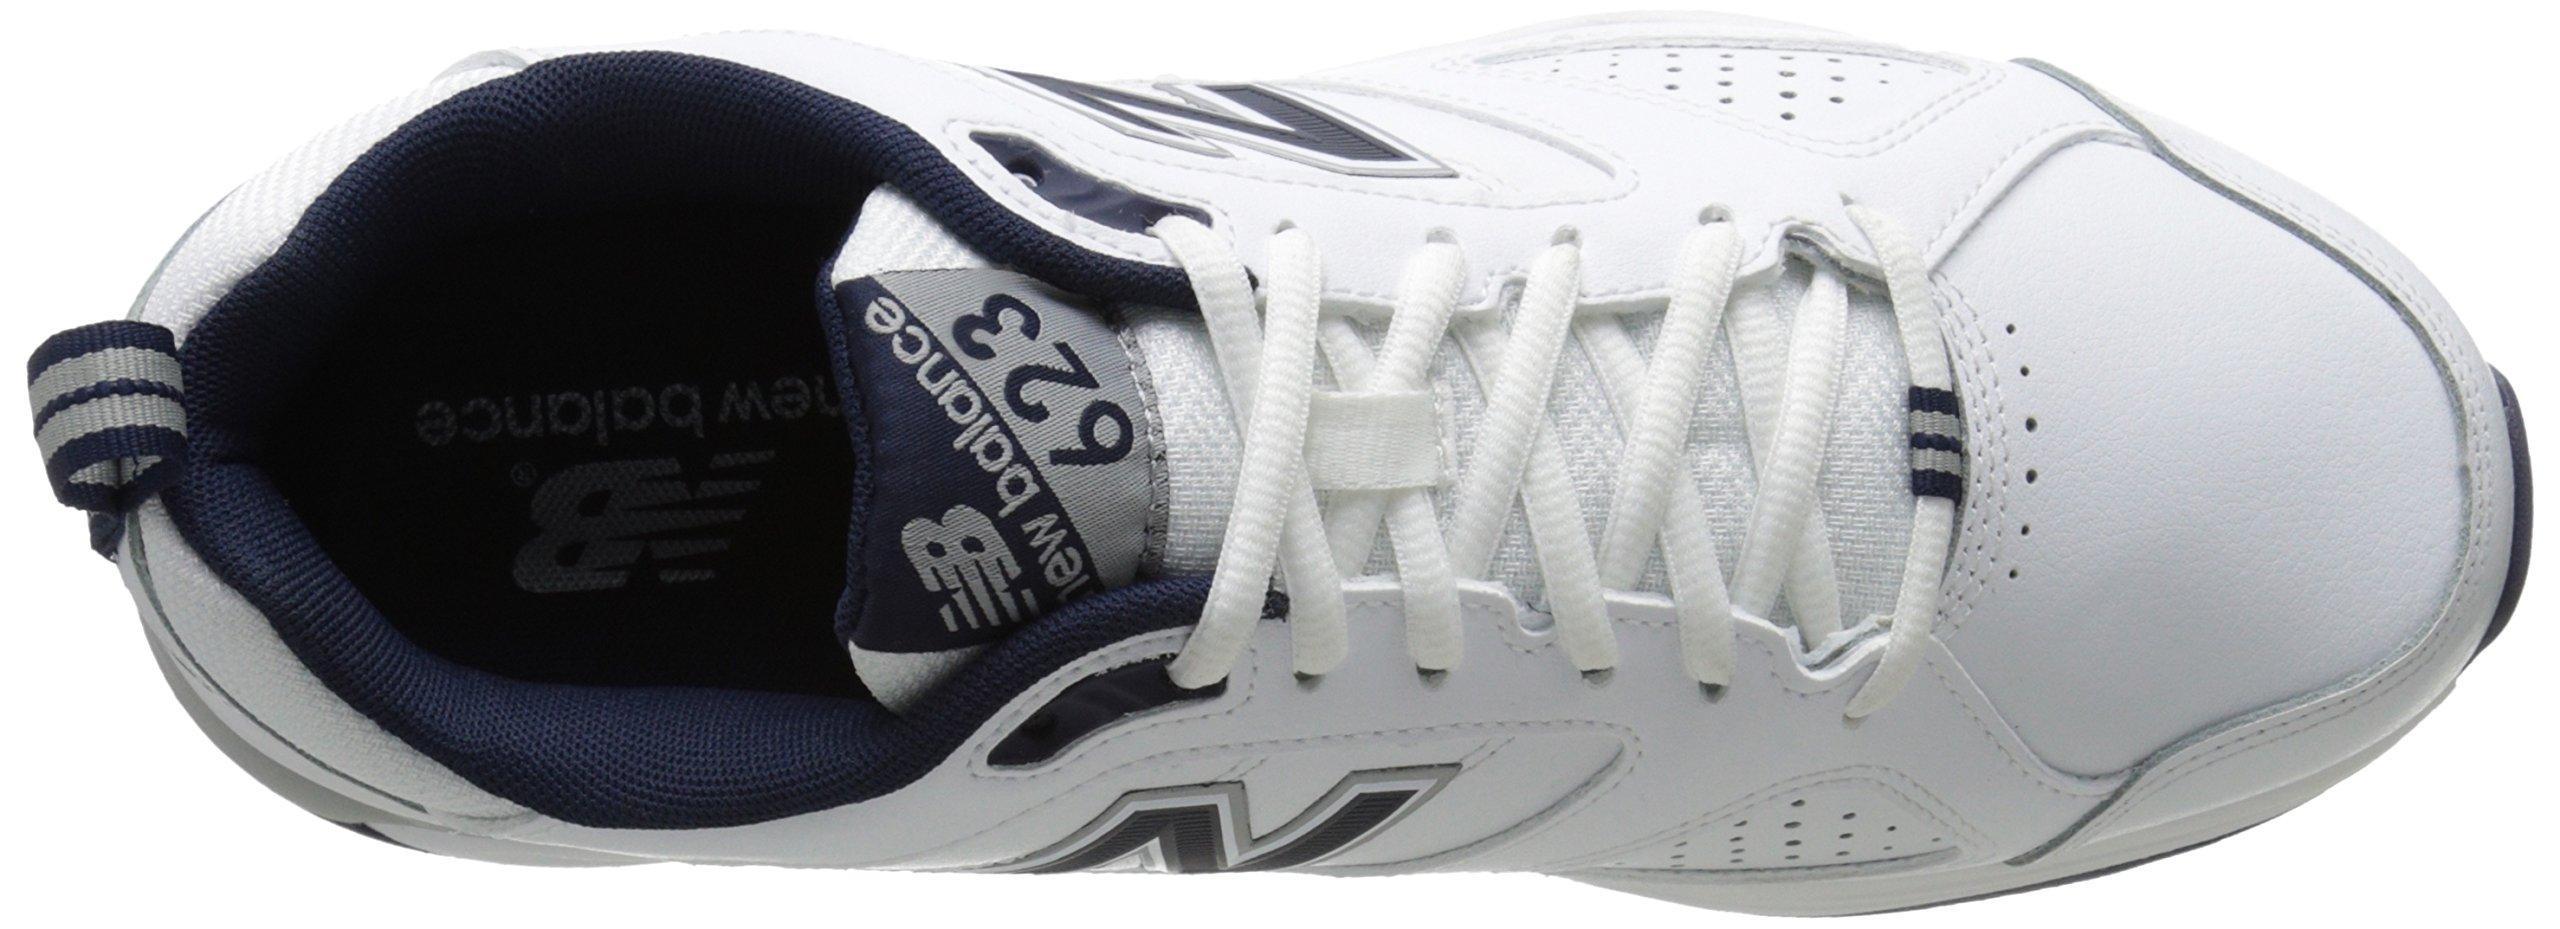 New Balance Men's MX623v3 Casual Comfort Training Shoe,  White/Navy, 8 M US by New Balance (Image #8)